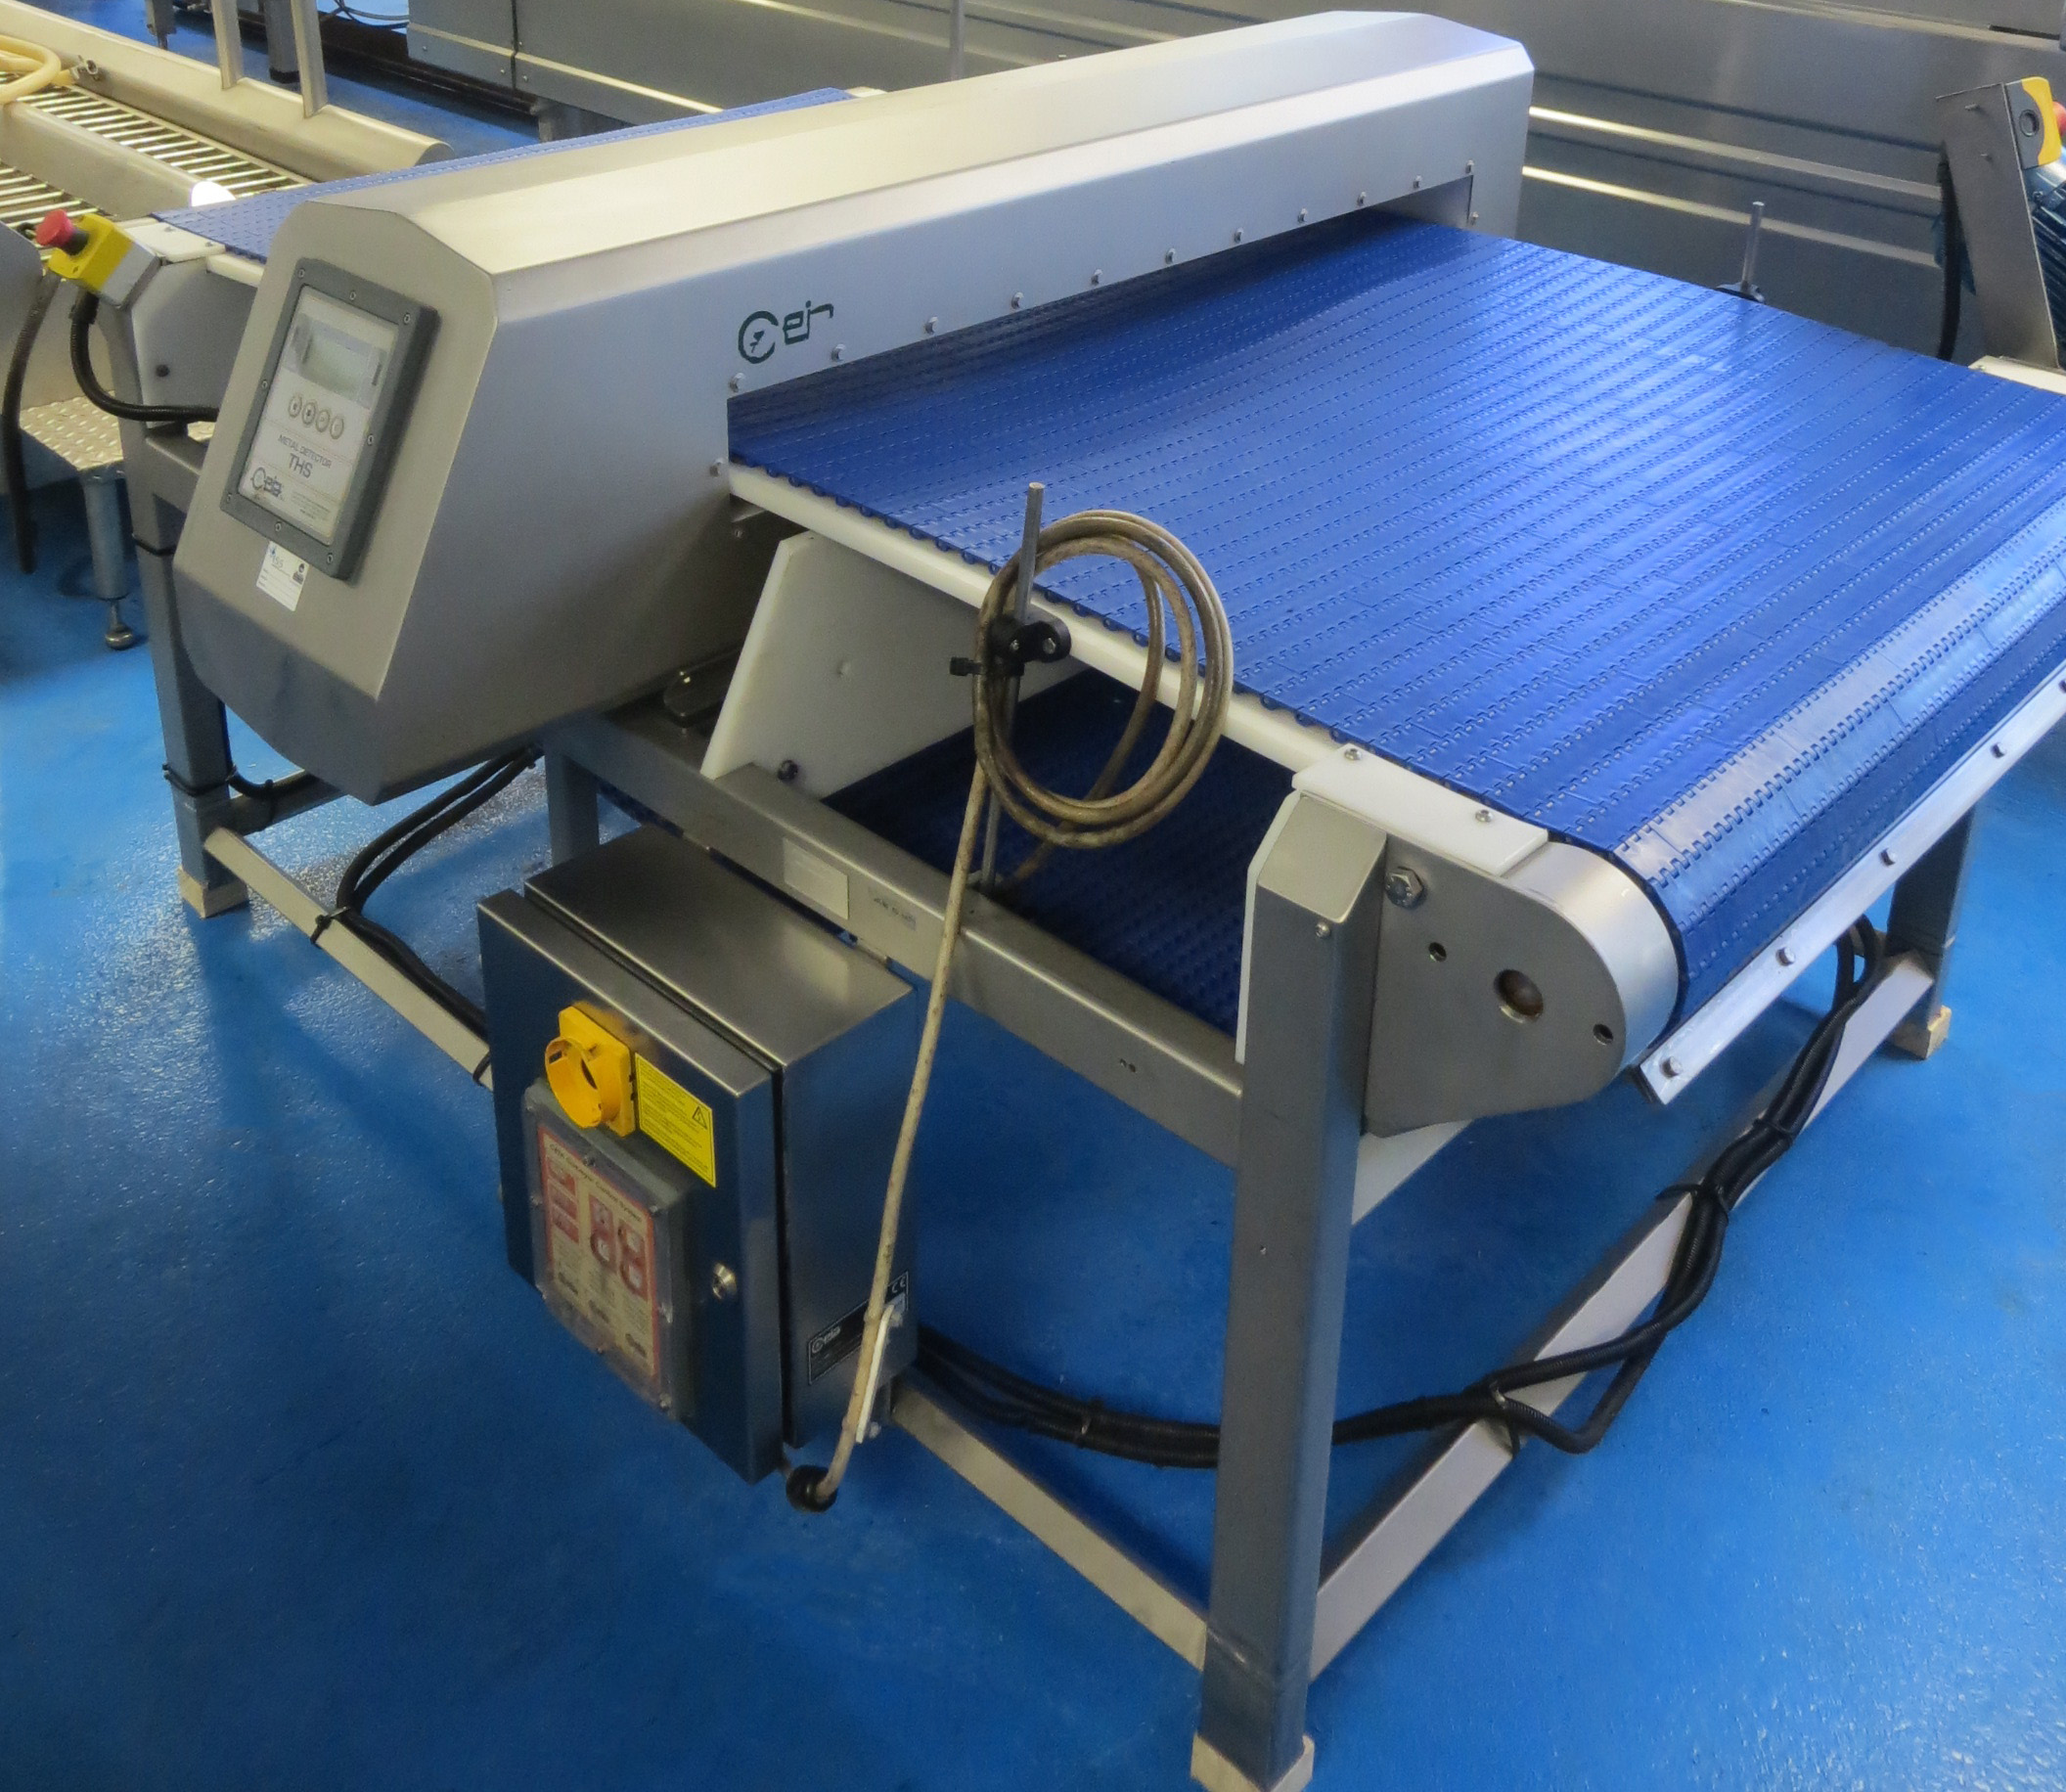 Jew Detector: 1 X CEIA Metal Detector. All S/s Machine. Aperture Size